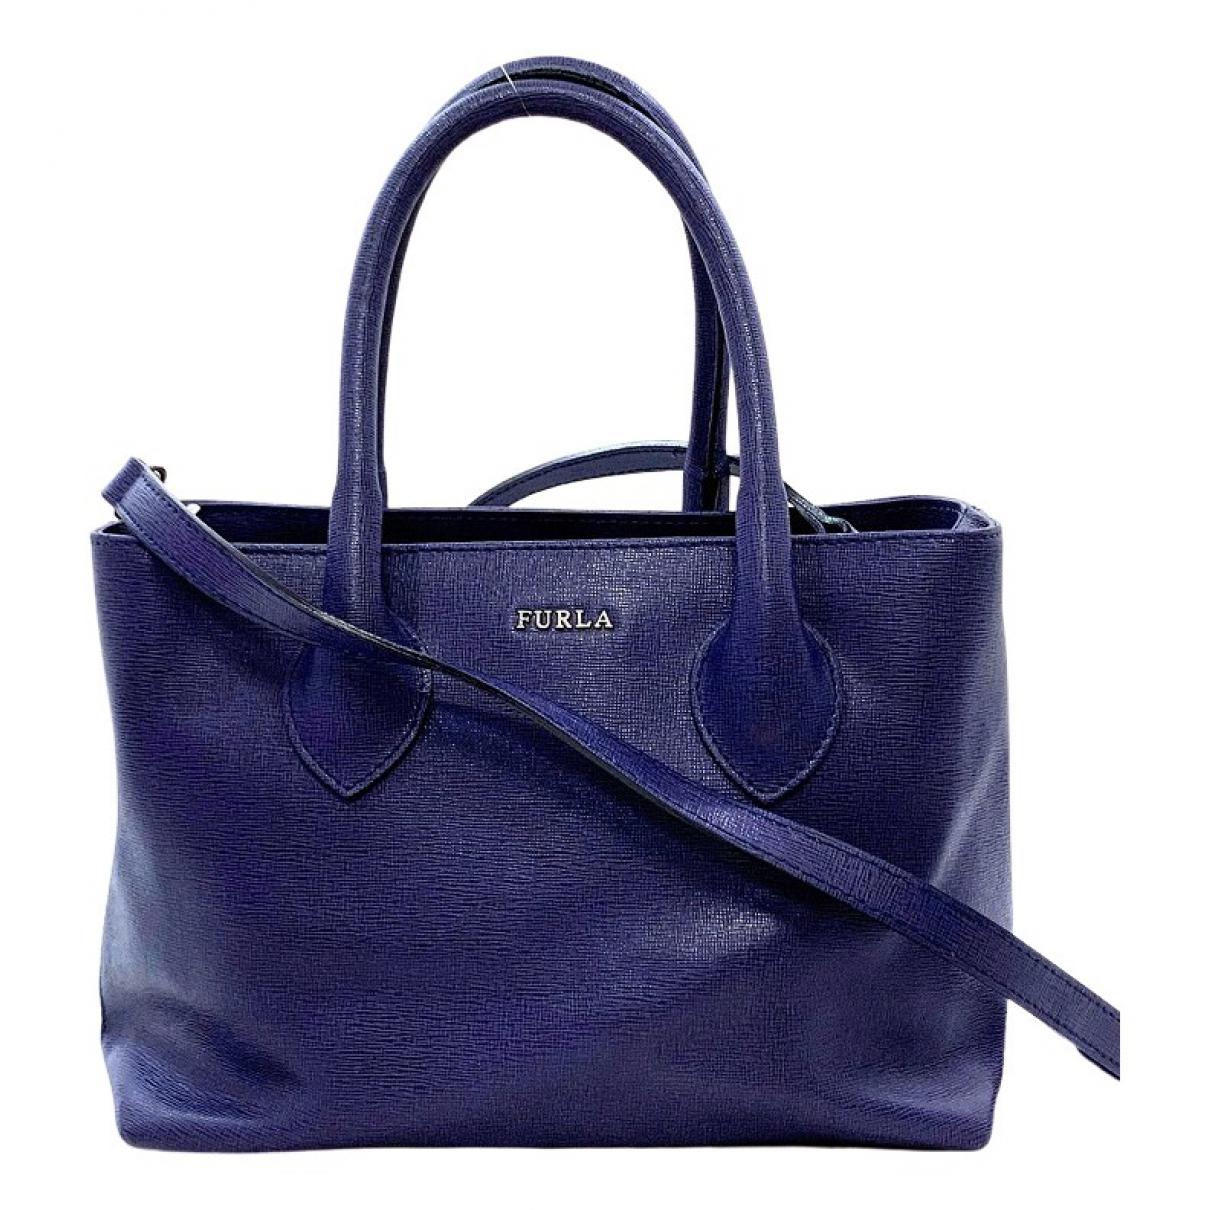 Furla \N Navy Leather handbag for Women \N